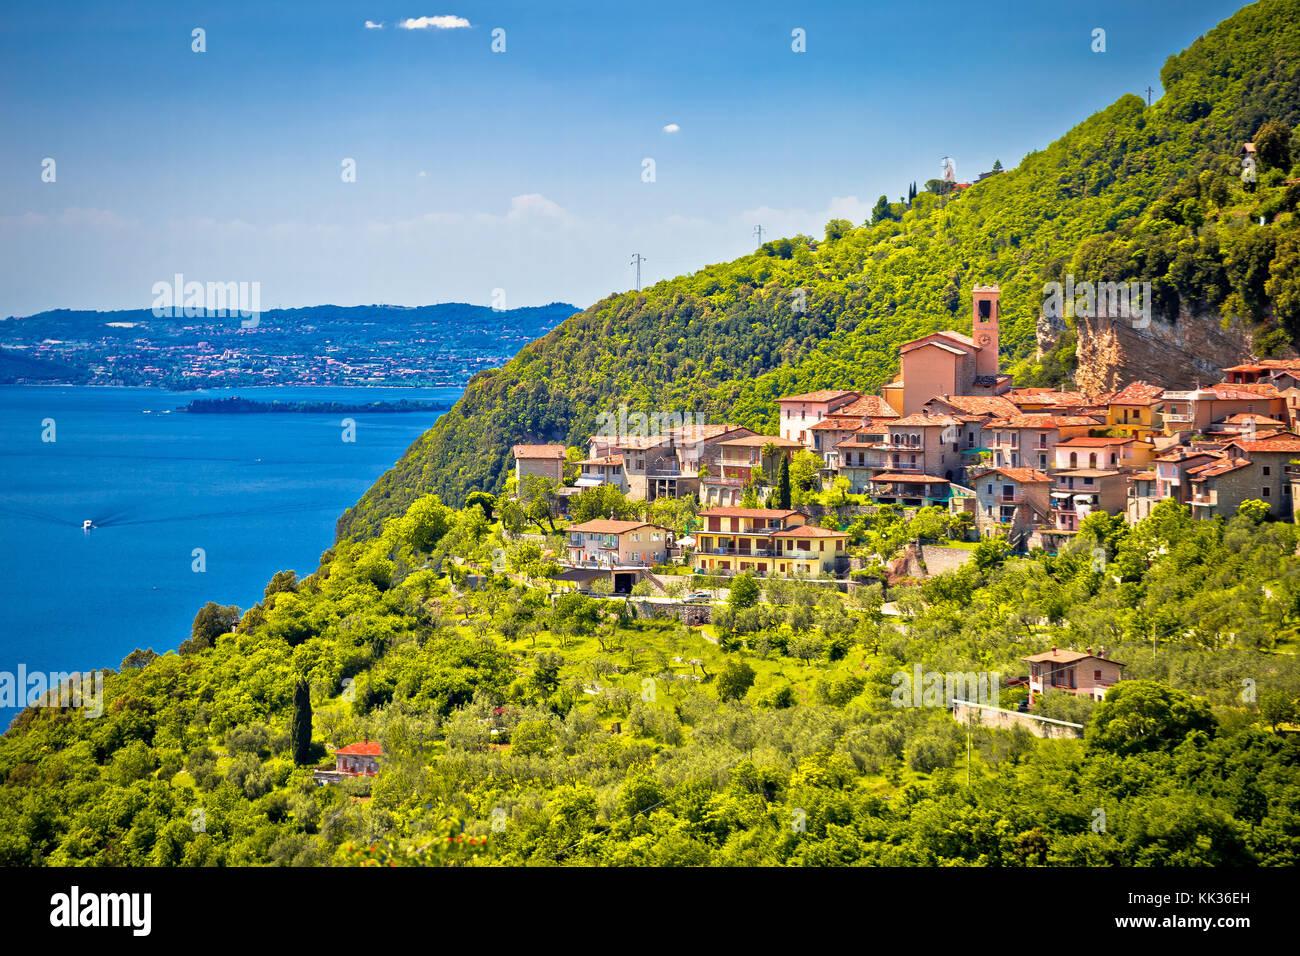 Idyllic village of Piovere on Garda lake cliffs, Lombardy region of Italy Stock Photo